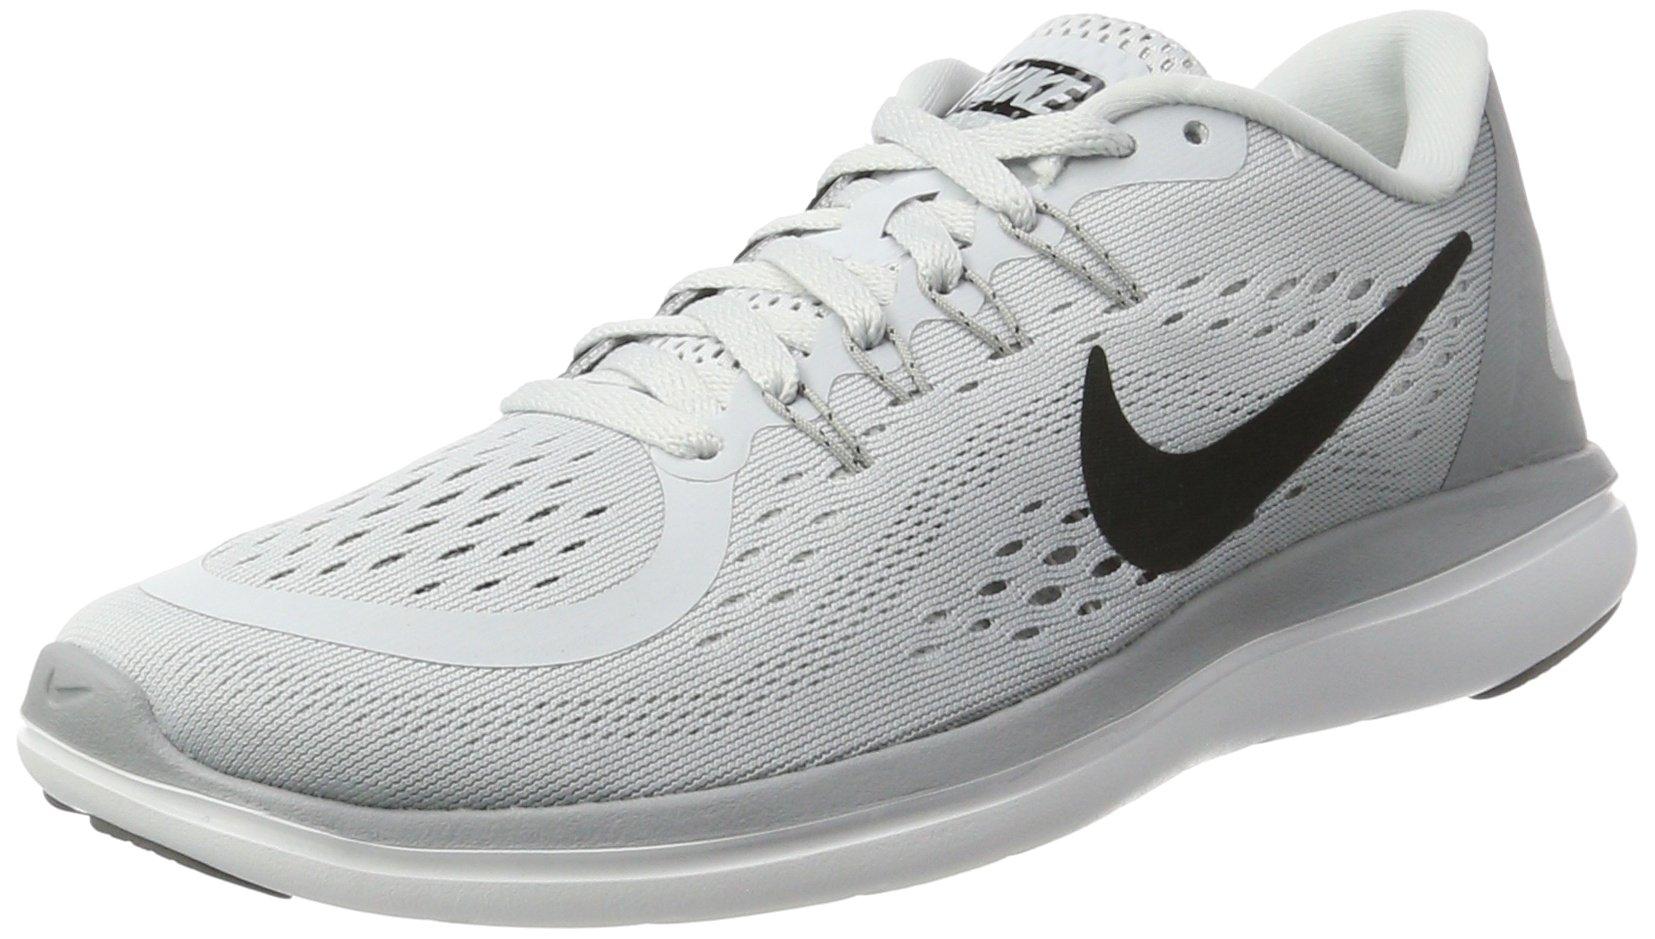 Nike Women's Flex 2017 RN Running Shoe (7, Pure Platinum/Black/Wolf Grey/Cool Grey) by Nike